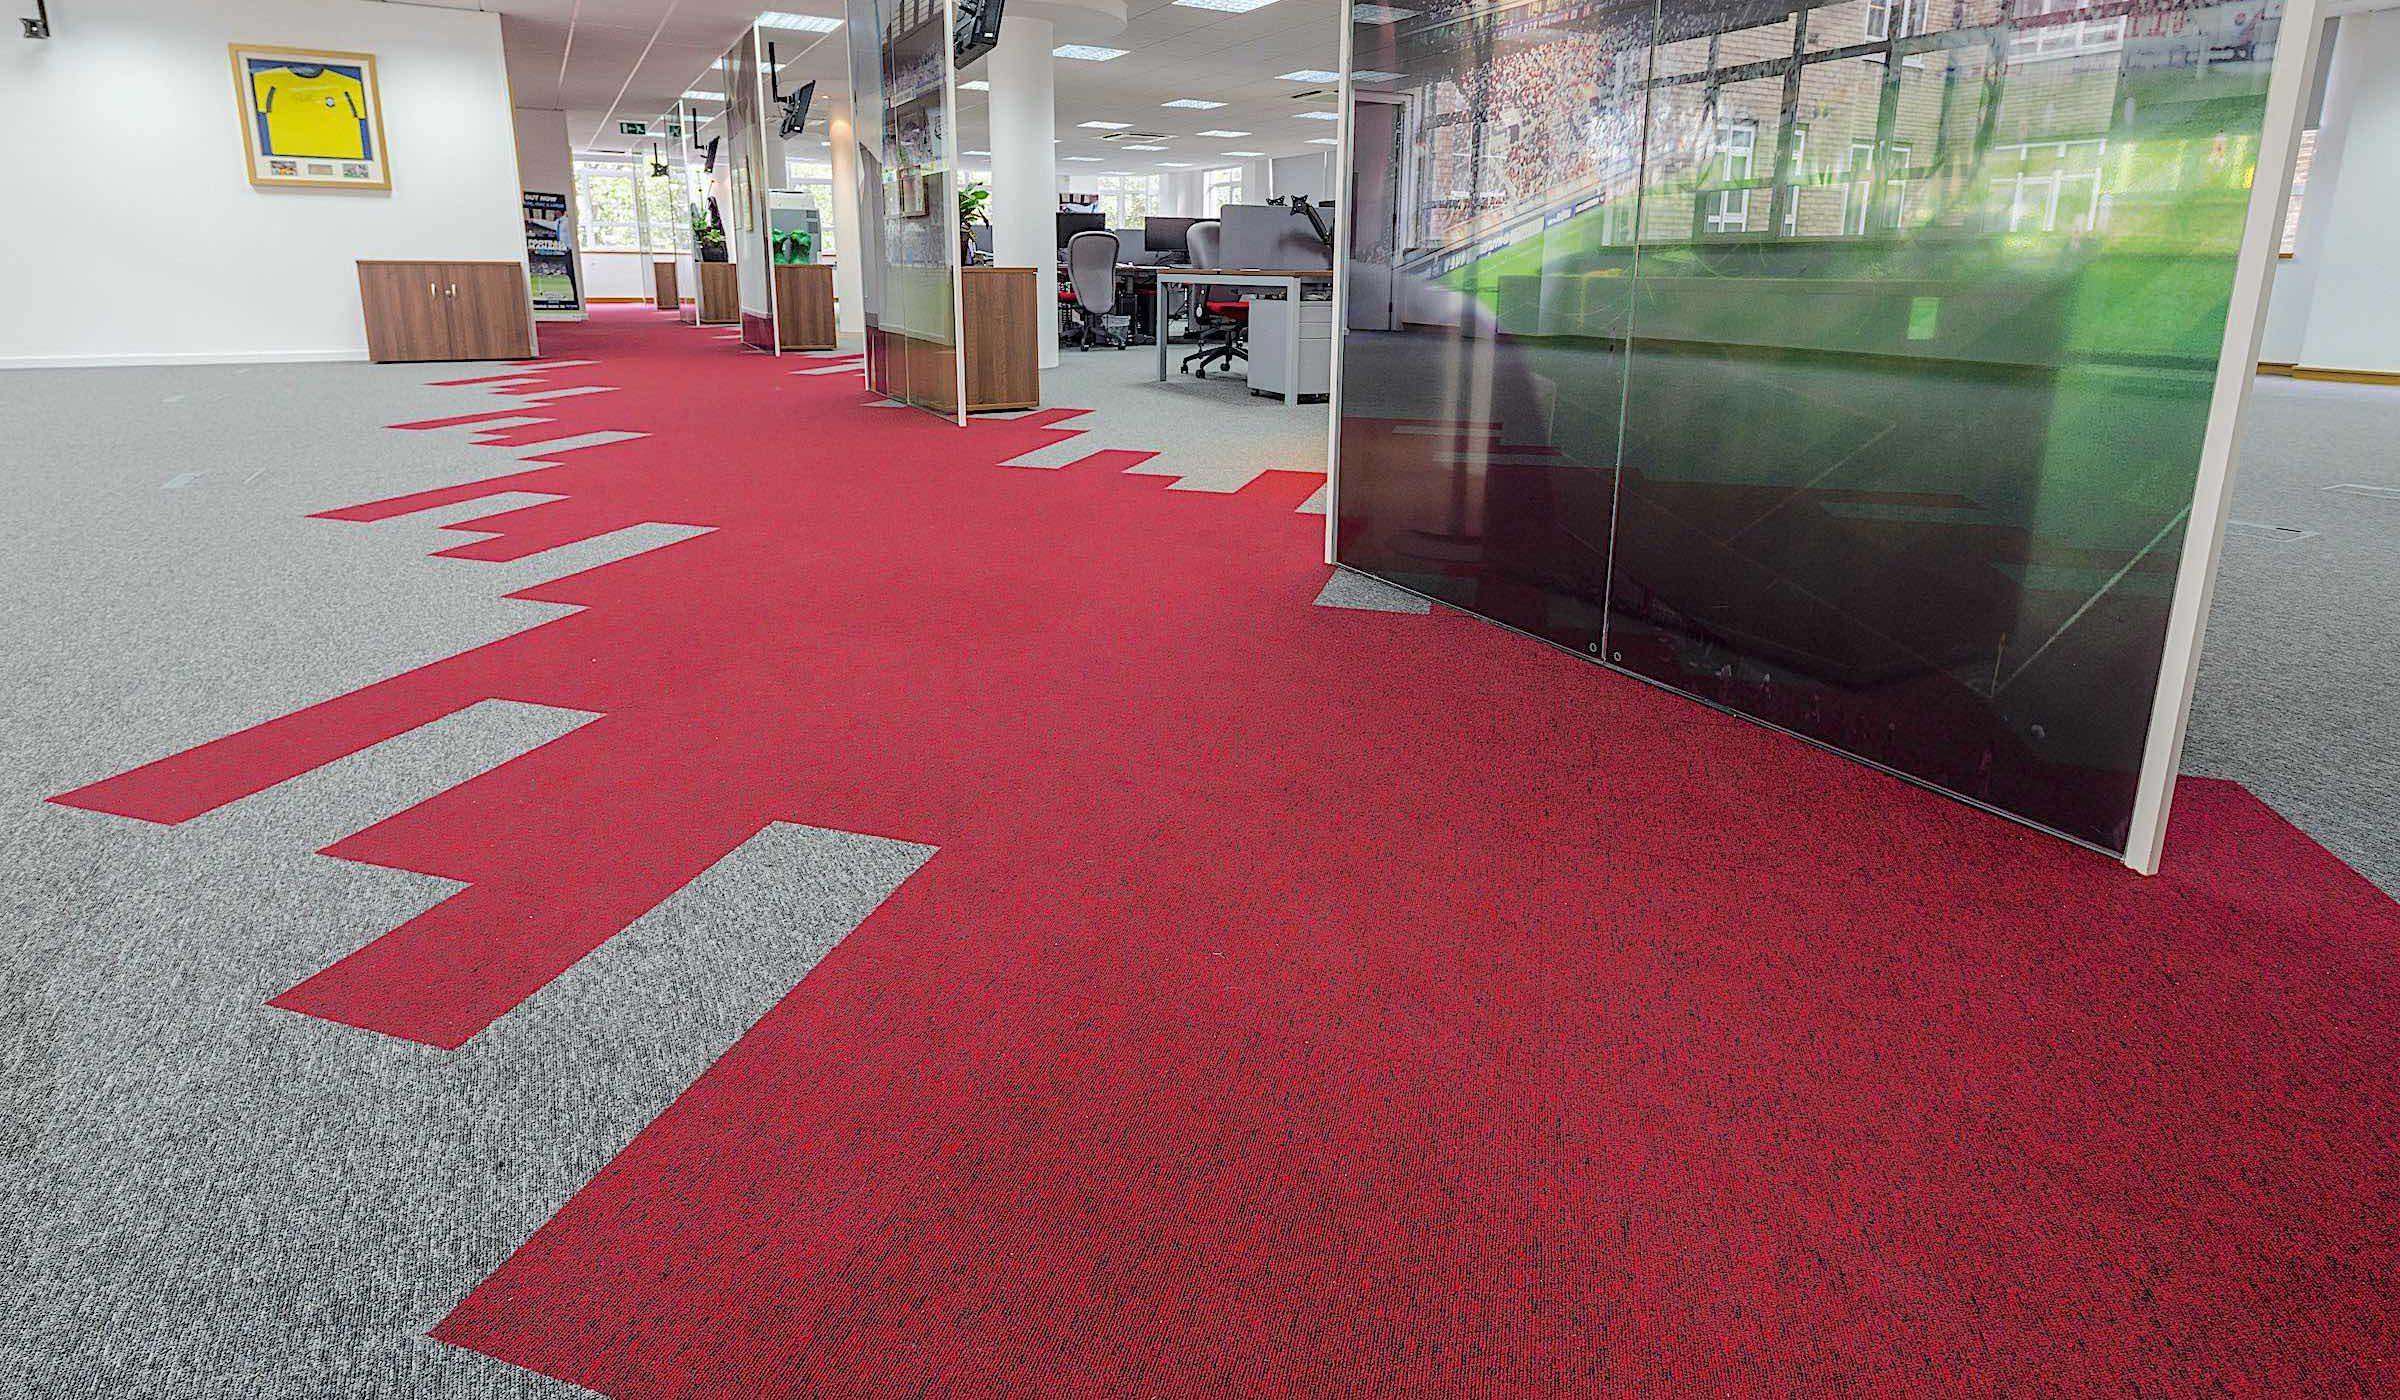 Sirocco | Paragon Carpet Tiles | Commercial Carpet Tiles | Design Carpet Tiles 2